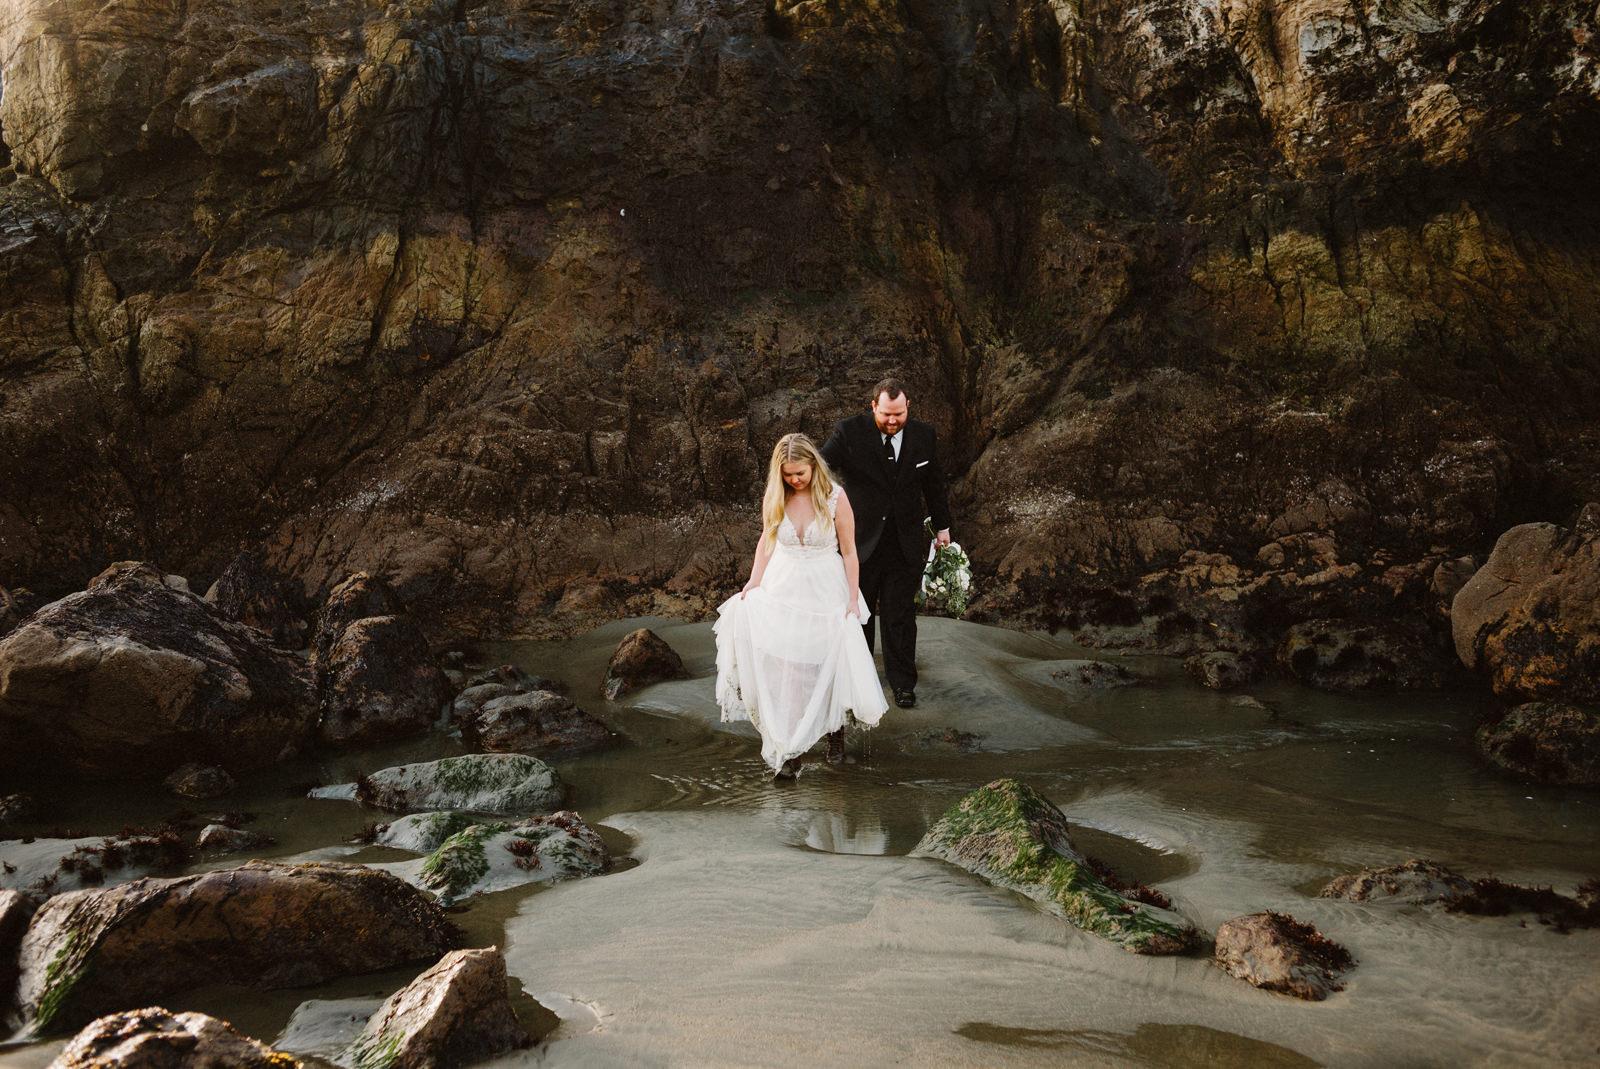 san-francisco-city-hall-elopement-54 SAN FRANCISCO CITY HALL INTIMATE WEDDING